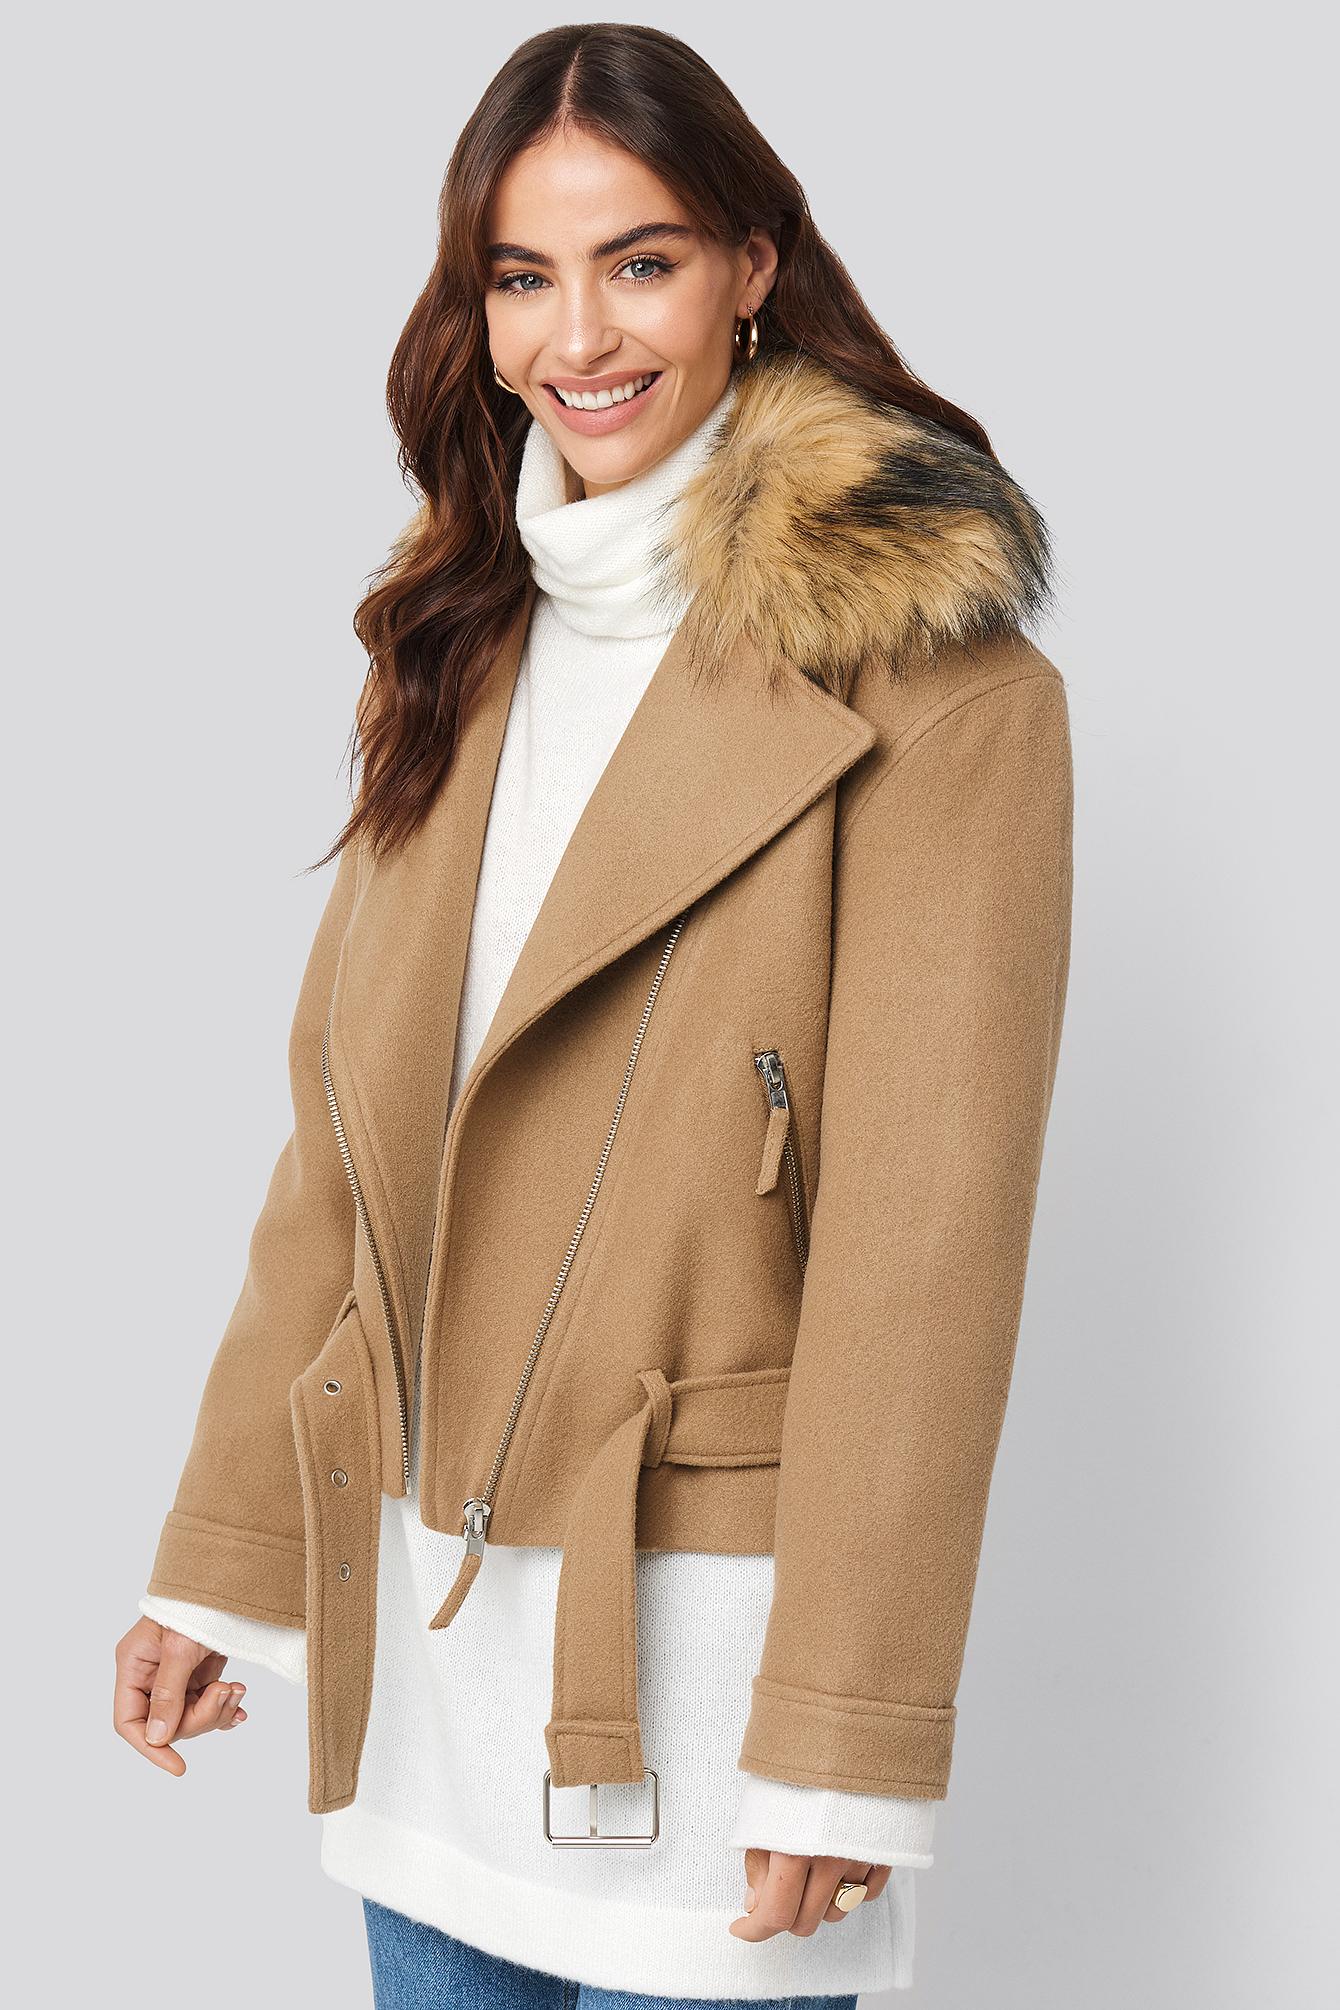 hannalicious x na-kd -  Faux Fur Collar Biker Jacket - Beige